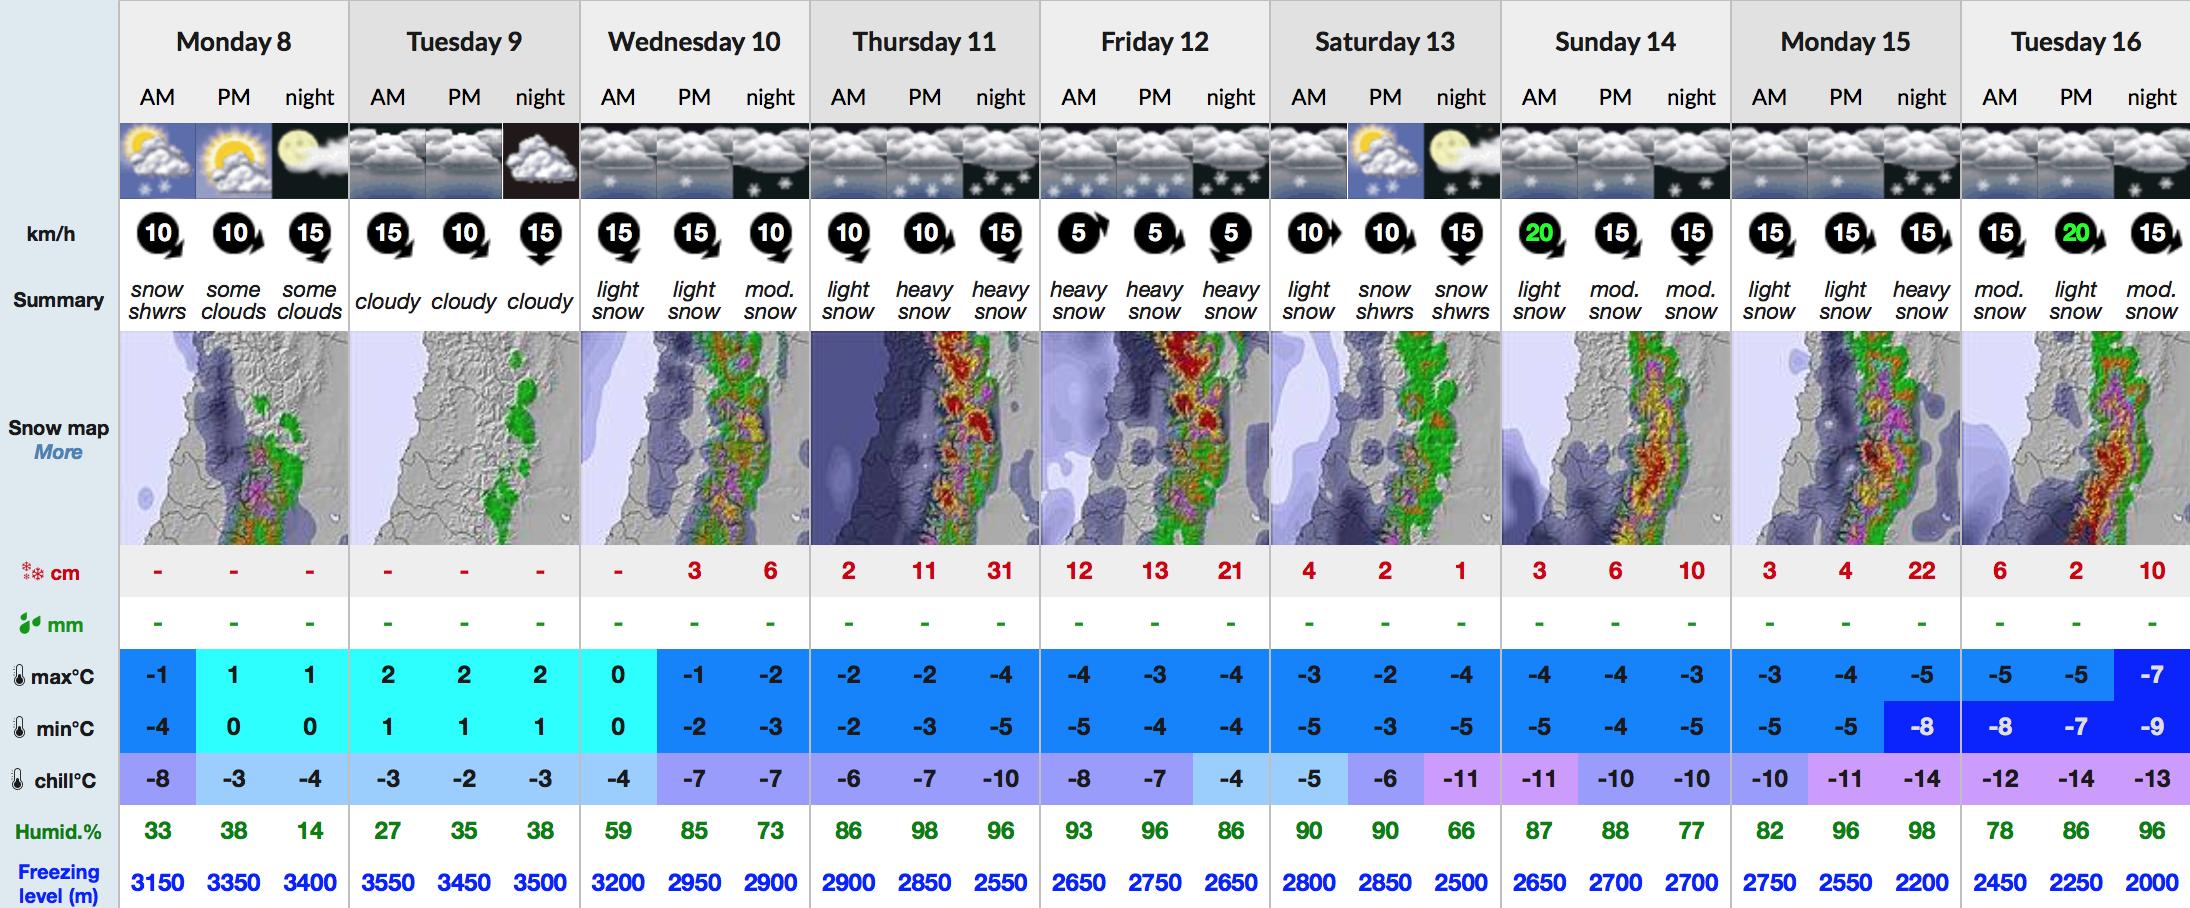 Snow-Forecast 9 day Valle Nevado mid 8-5-17